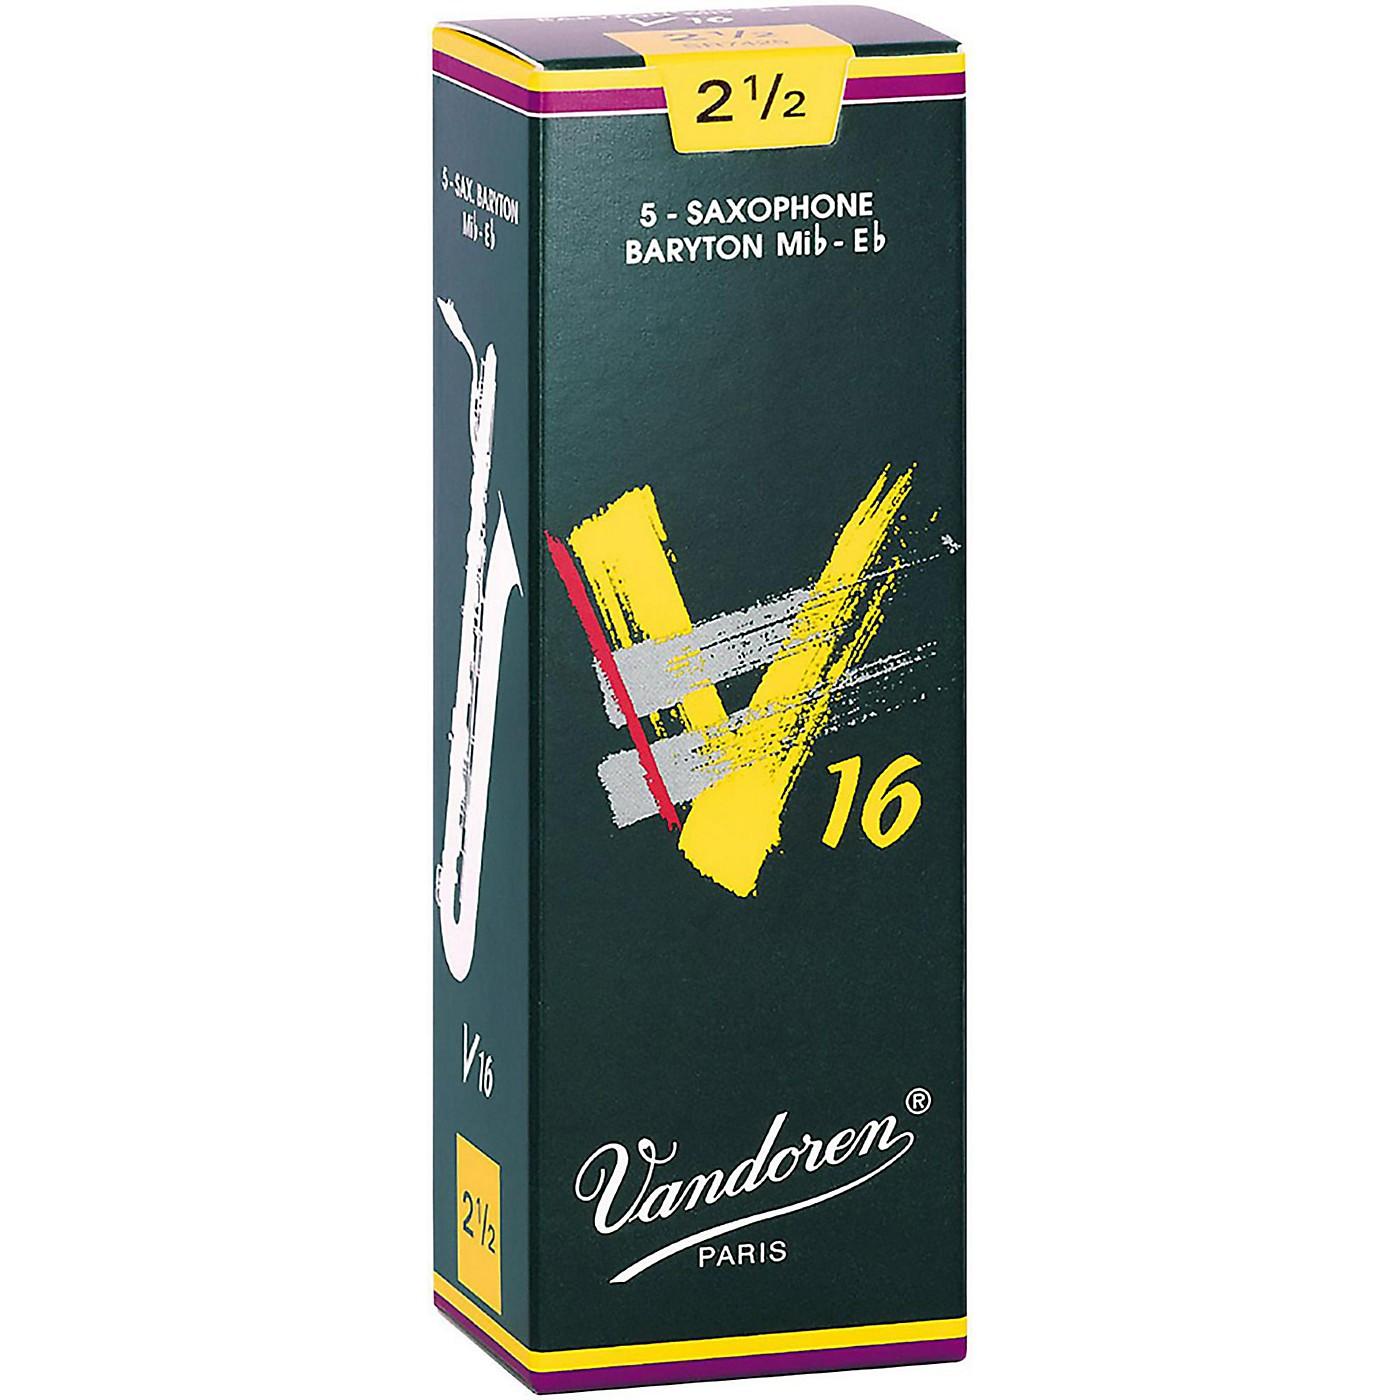 Vandoren Baritone Saxophone V16 Reeds Box of 5 thumbnail